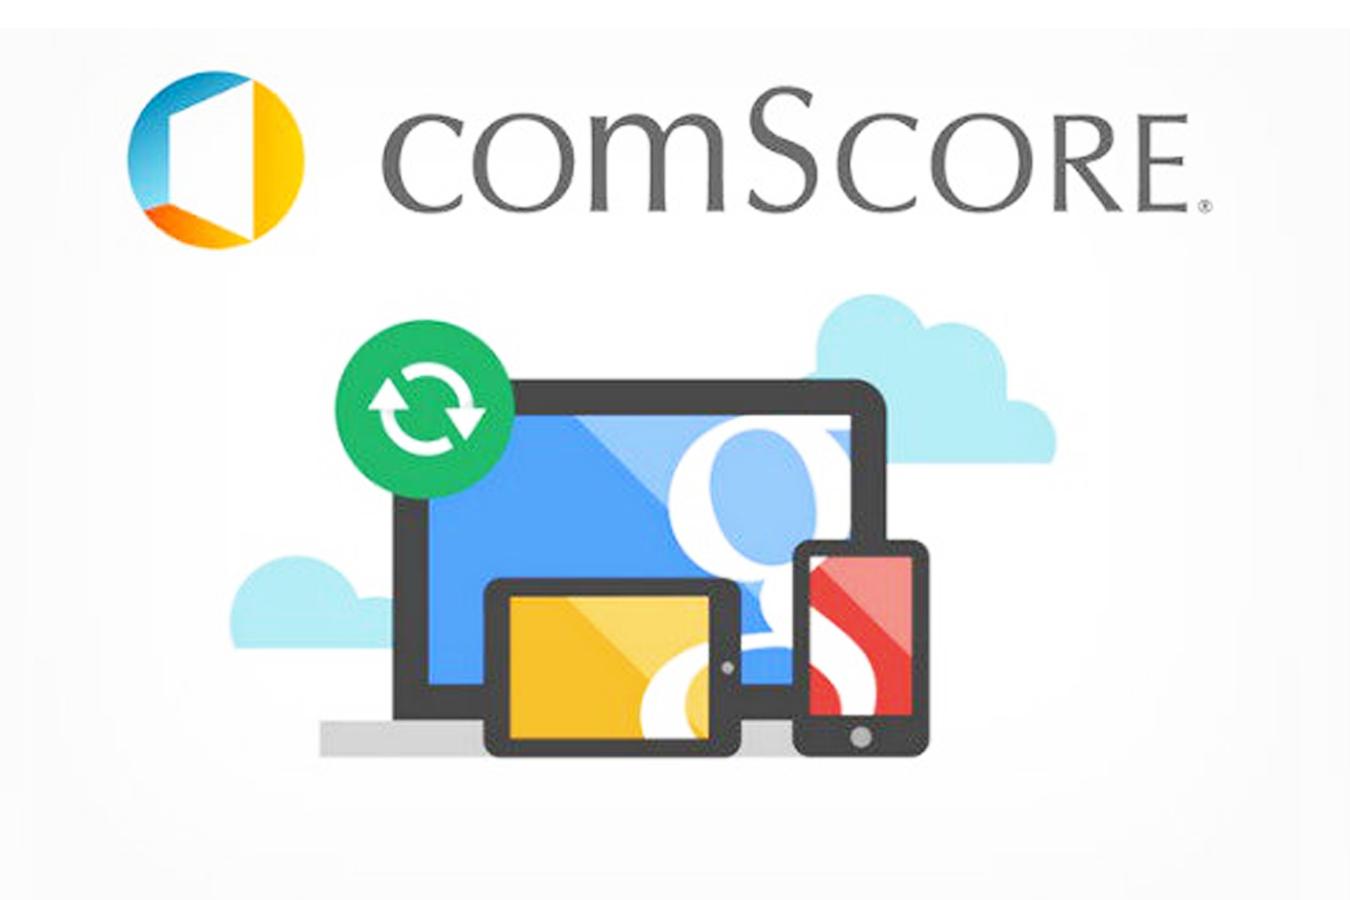 google_conscore